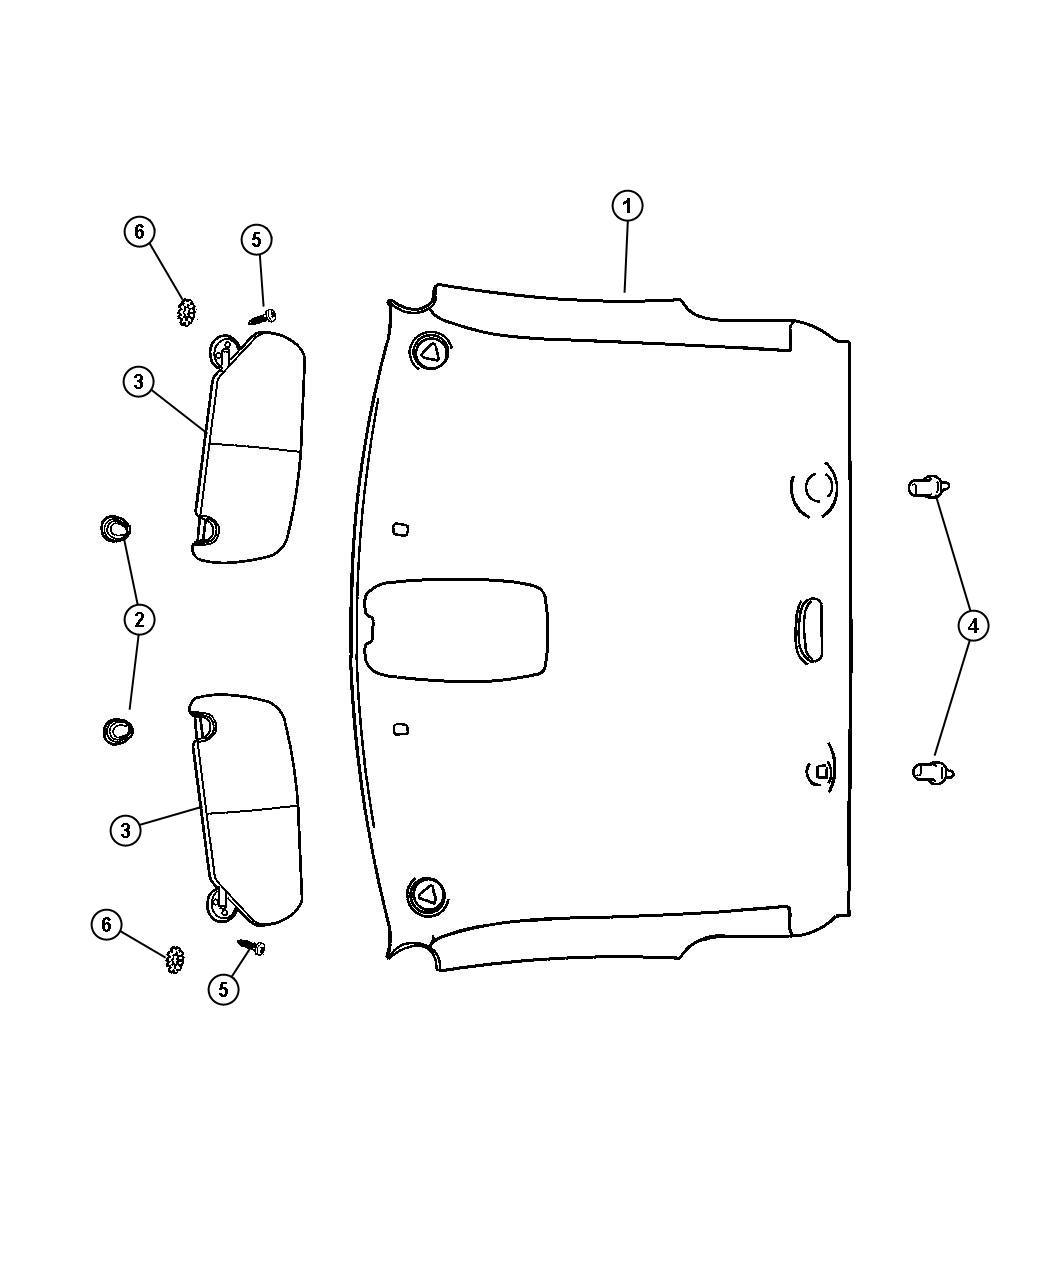 2010 Dodge Journey Hook. Coat. Trim: [all trim codes